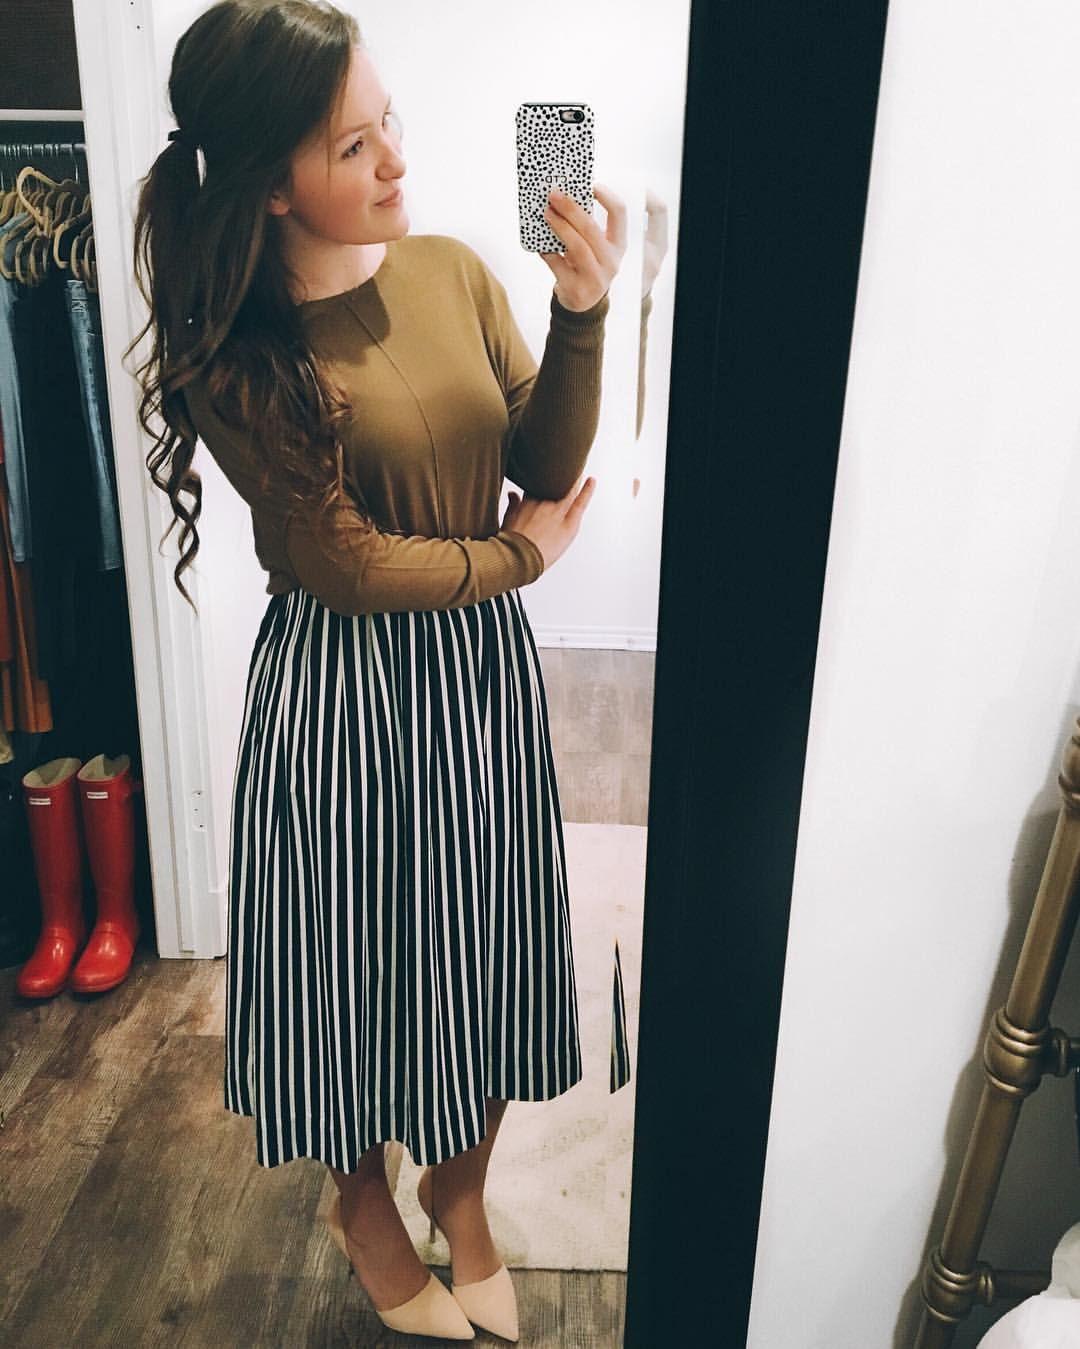 2e5c81c5c75 Courtney Toliver ( courtneytoliver) • Instagram photos and videos ...